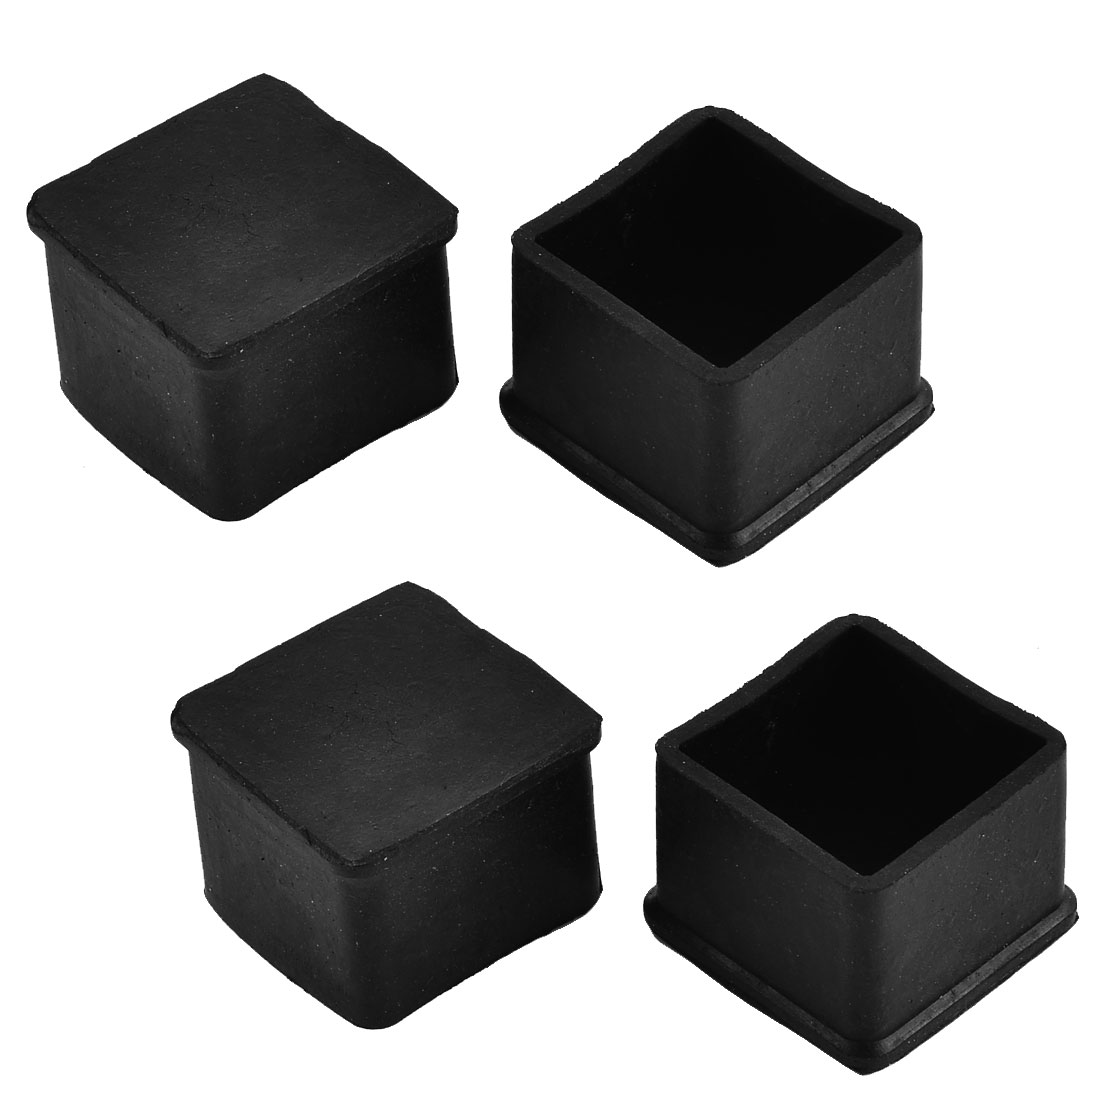 38mm x 38mm Square Shaped Furniture Table Desk Foot Leg Rubber End Cap Cover Black 4pcs